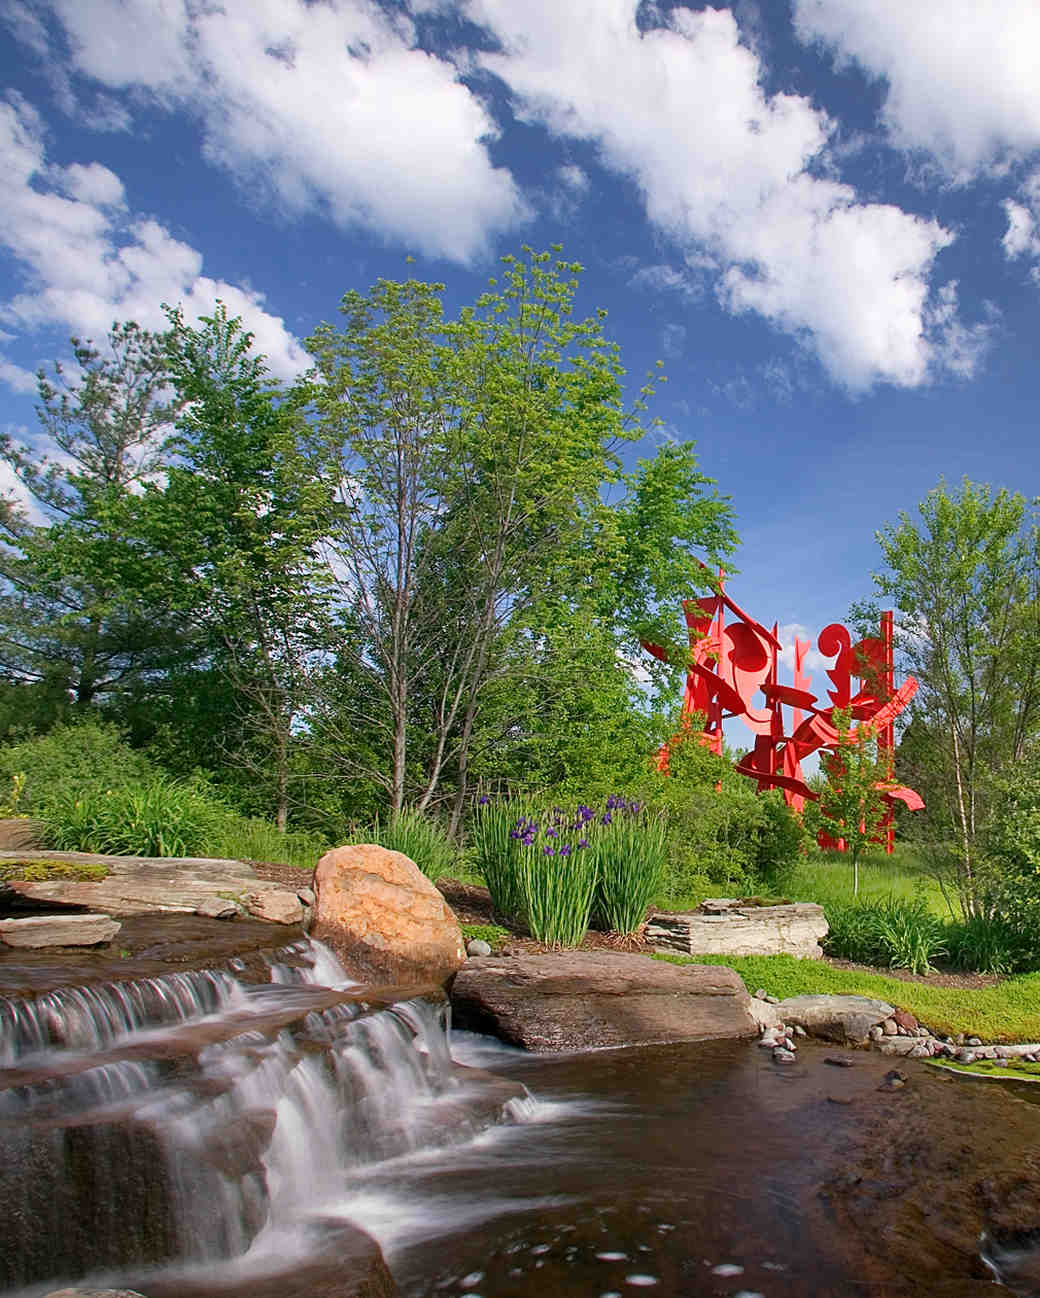 botanic-gardens-wedding-venues-frederik-meijer-gardens-sculpture-park-0815.jpg